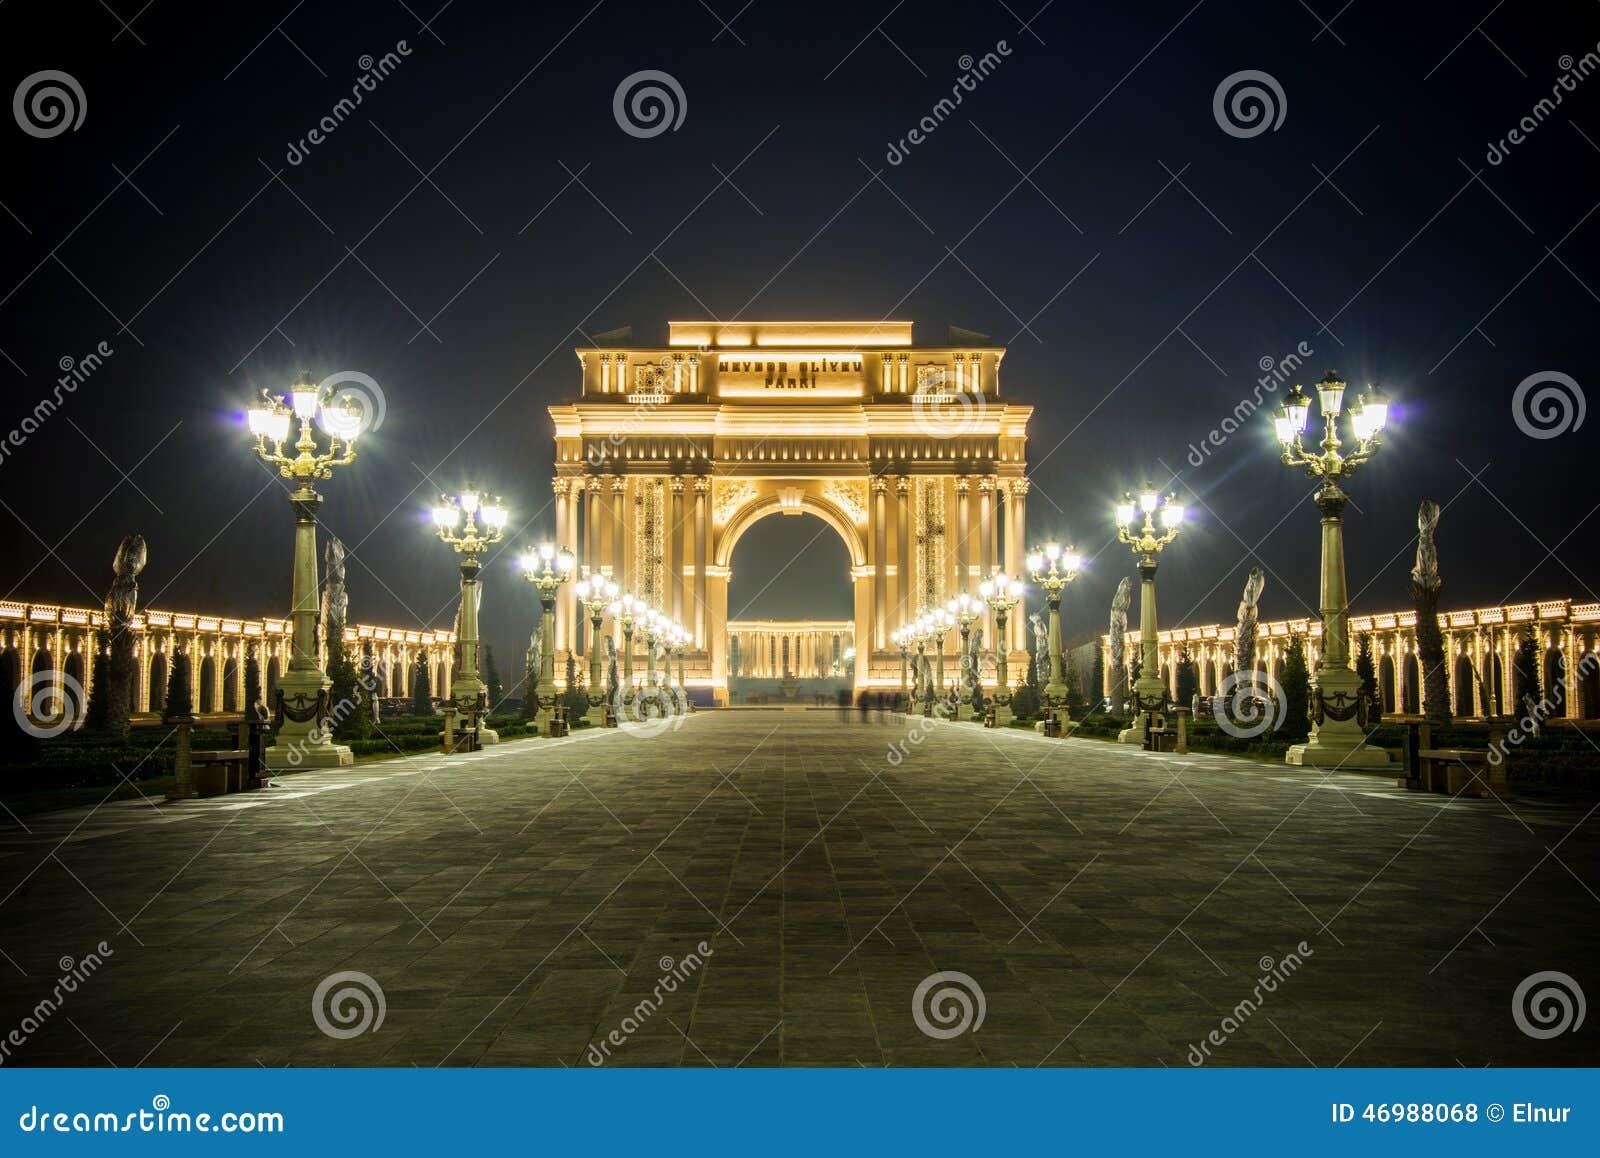 Triumph Arch on February 15 in Azerb